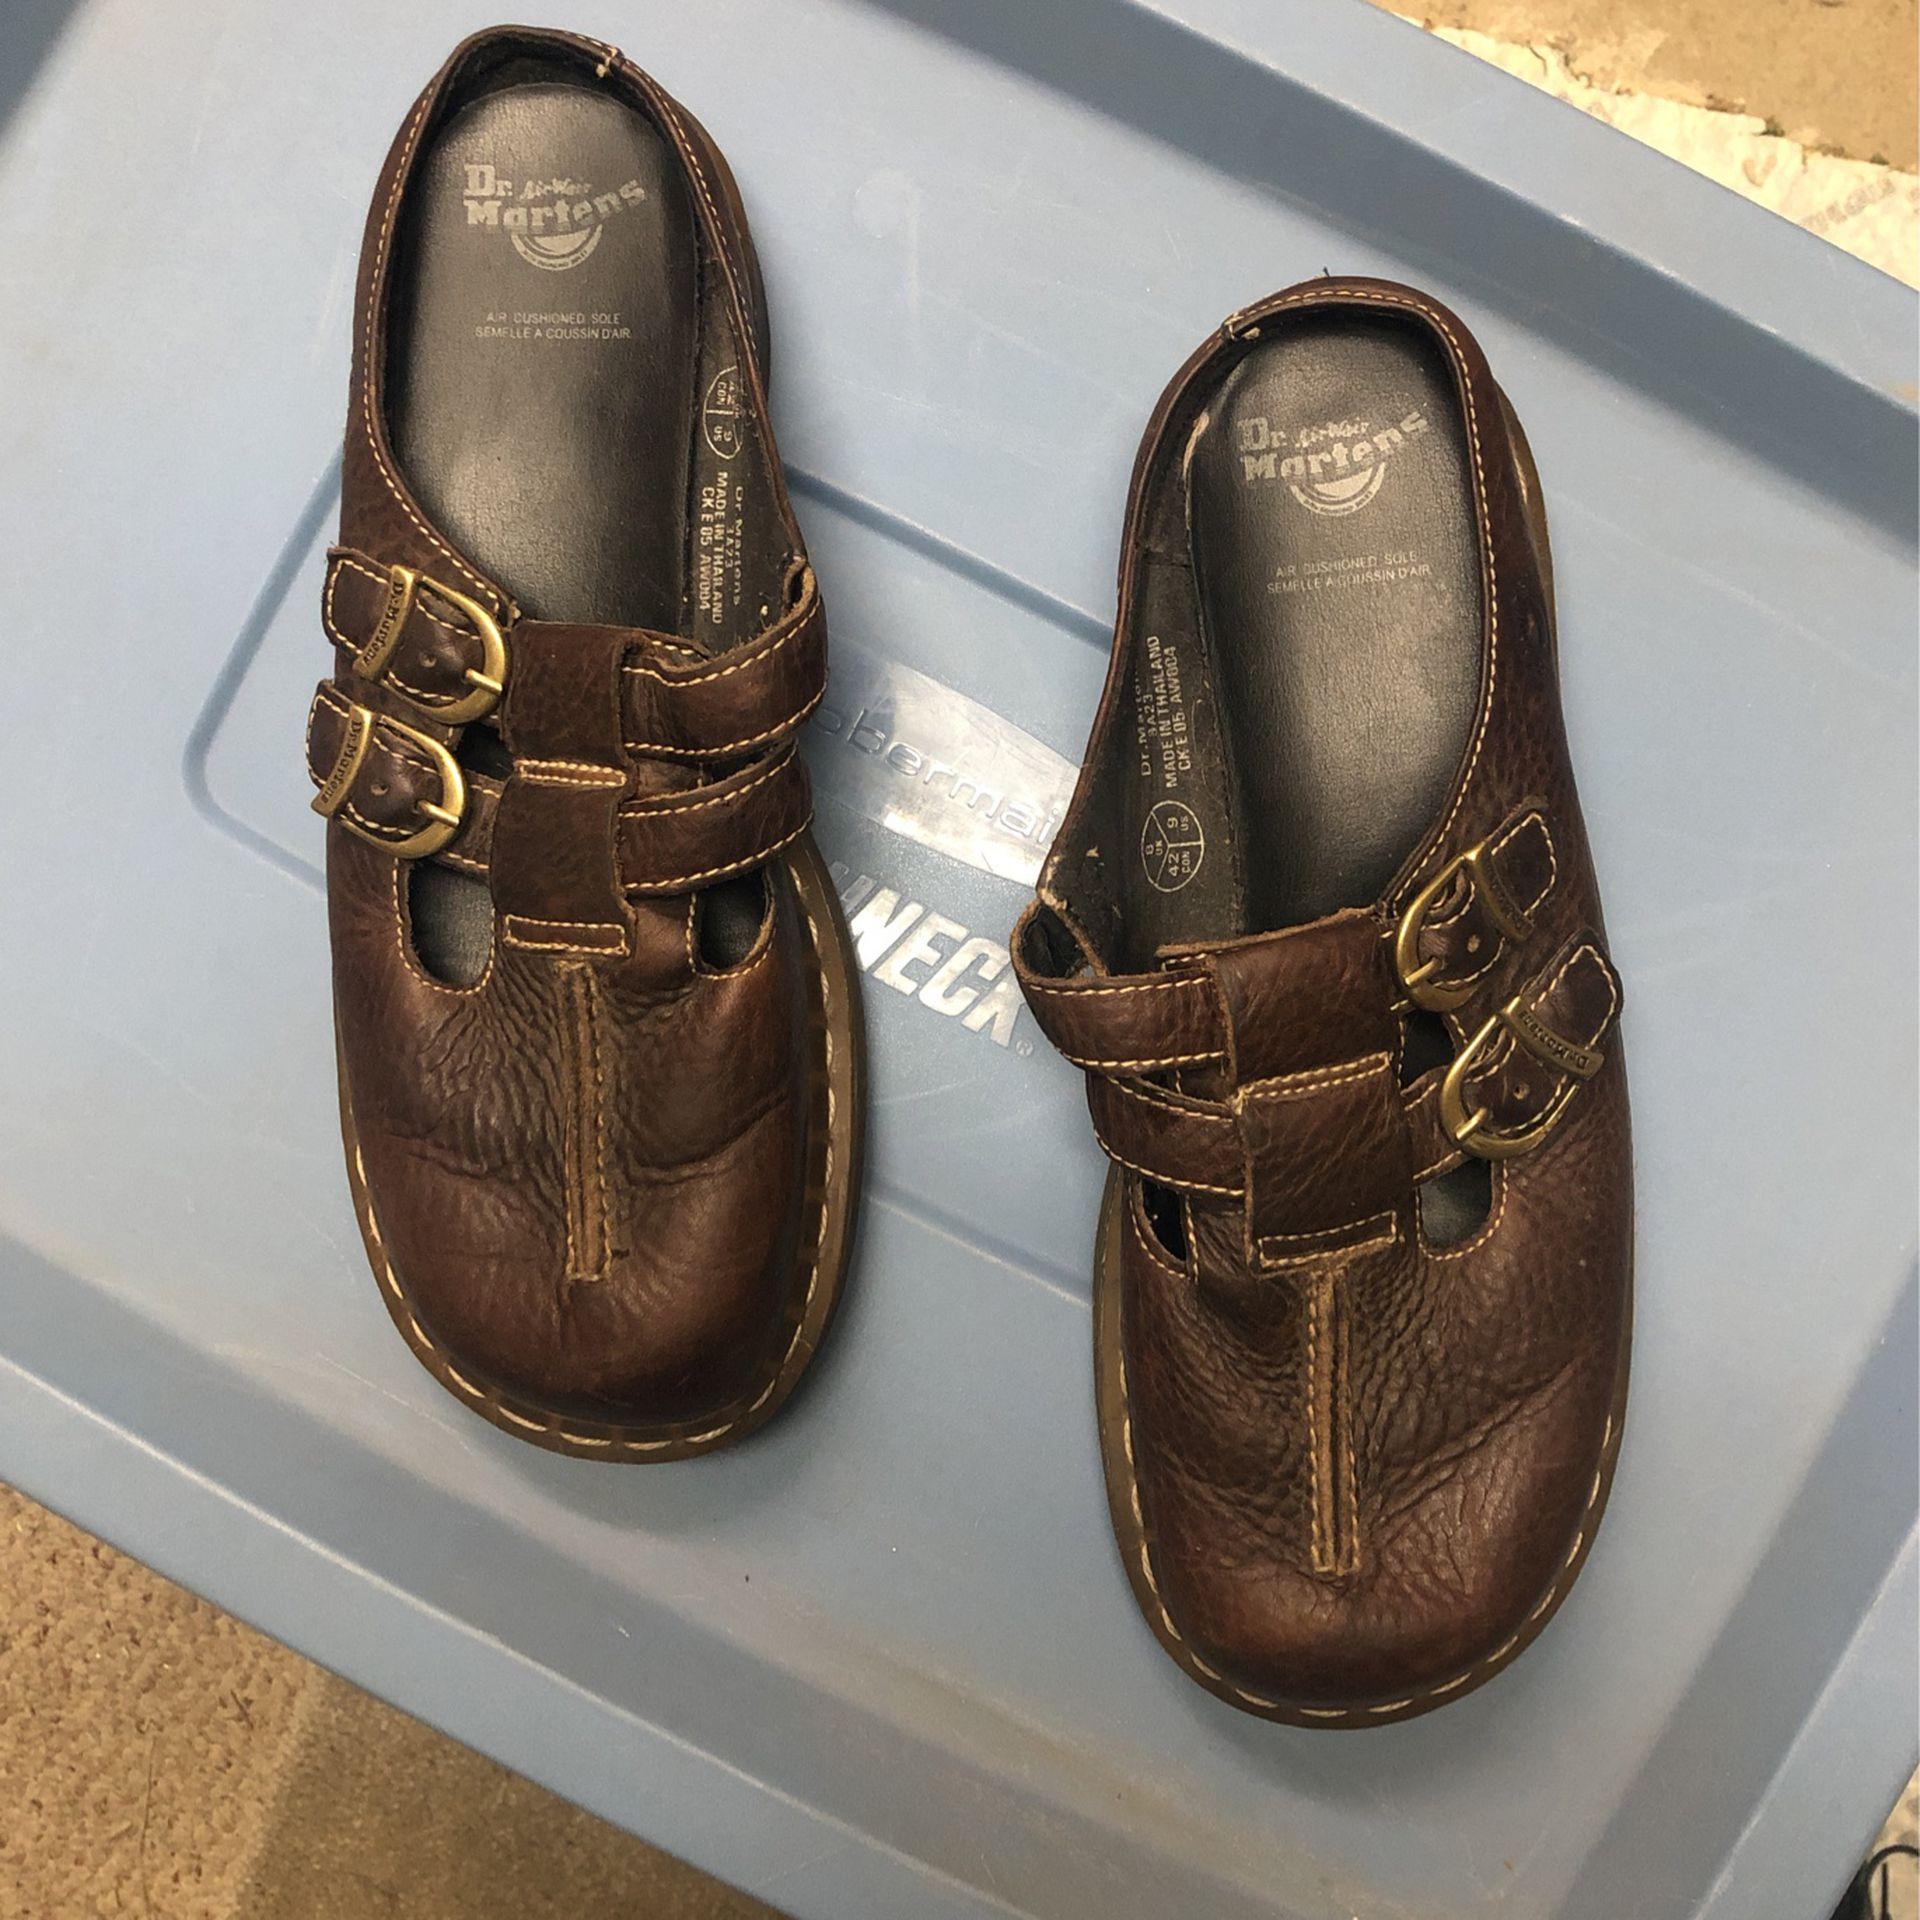 Dr Martens  Women's Slip on Shoes